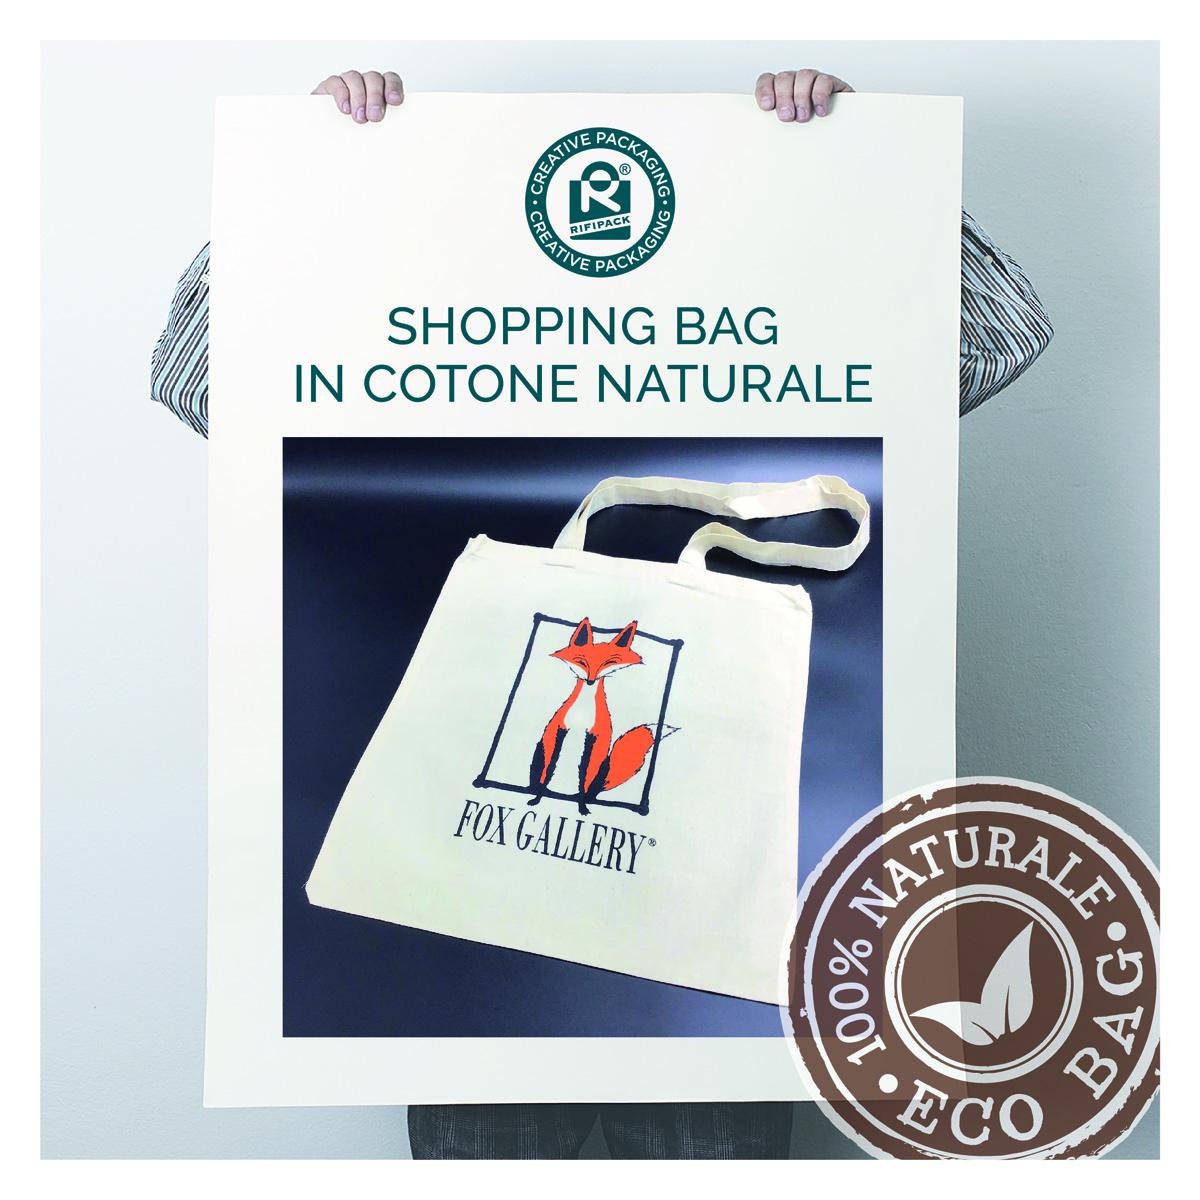 rifipack-shopping-bag-shopper-borse-sportine-in-cotone-naturale-eco-bag-naturale-1